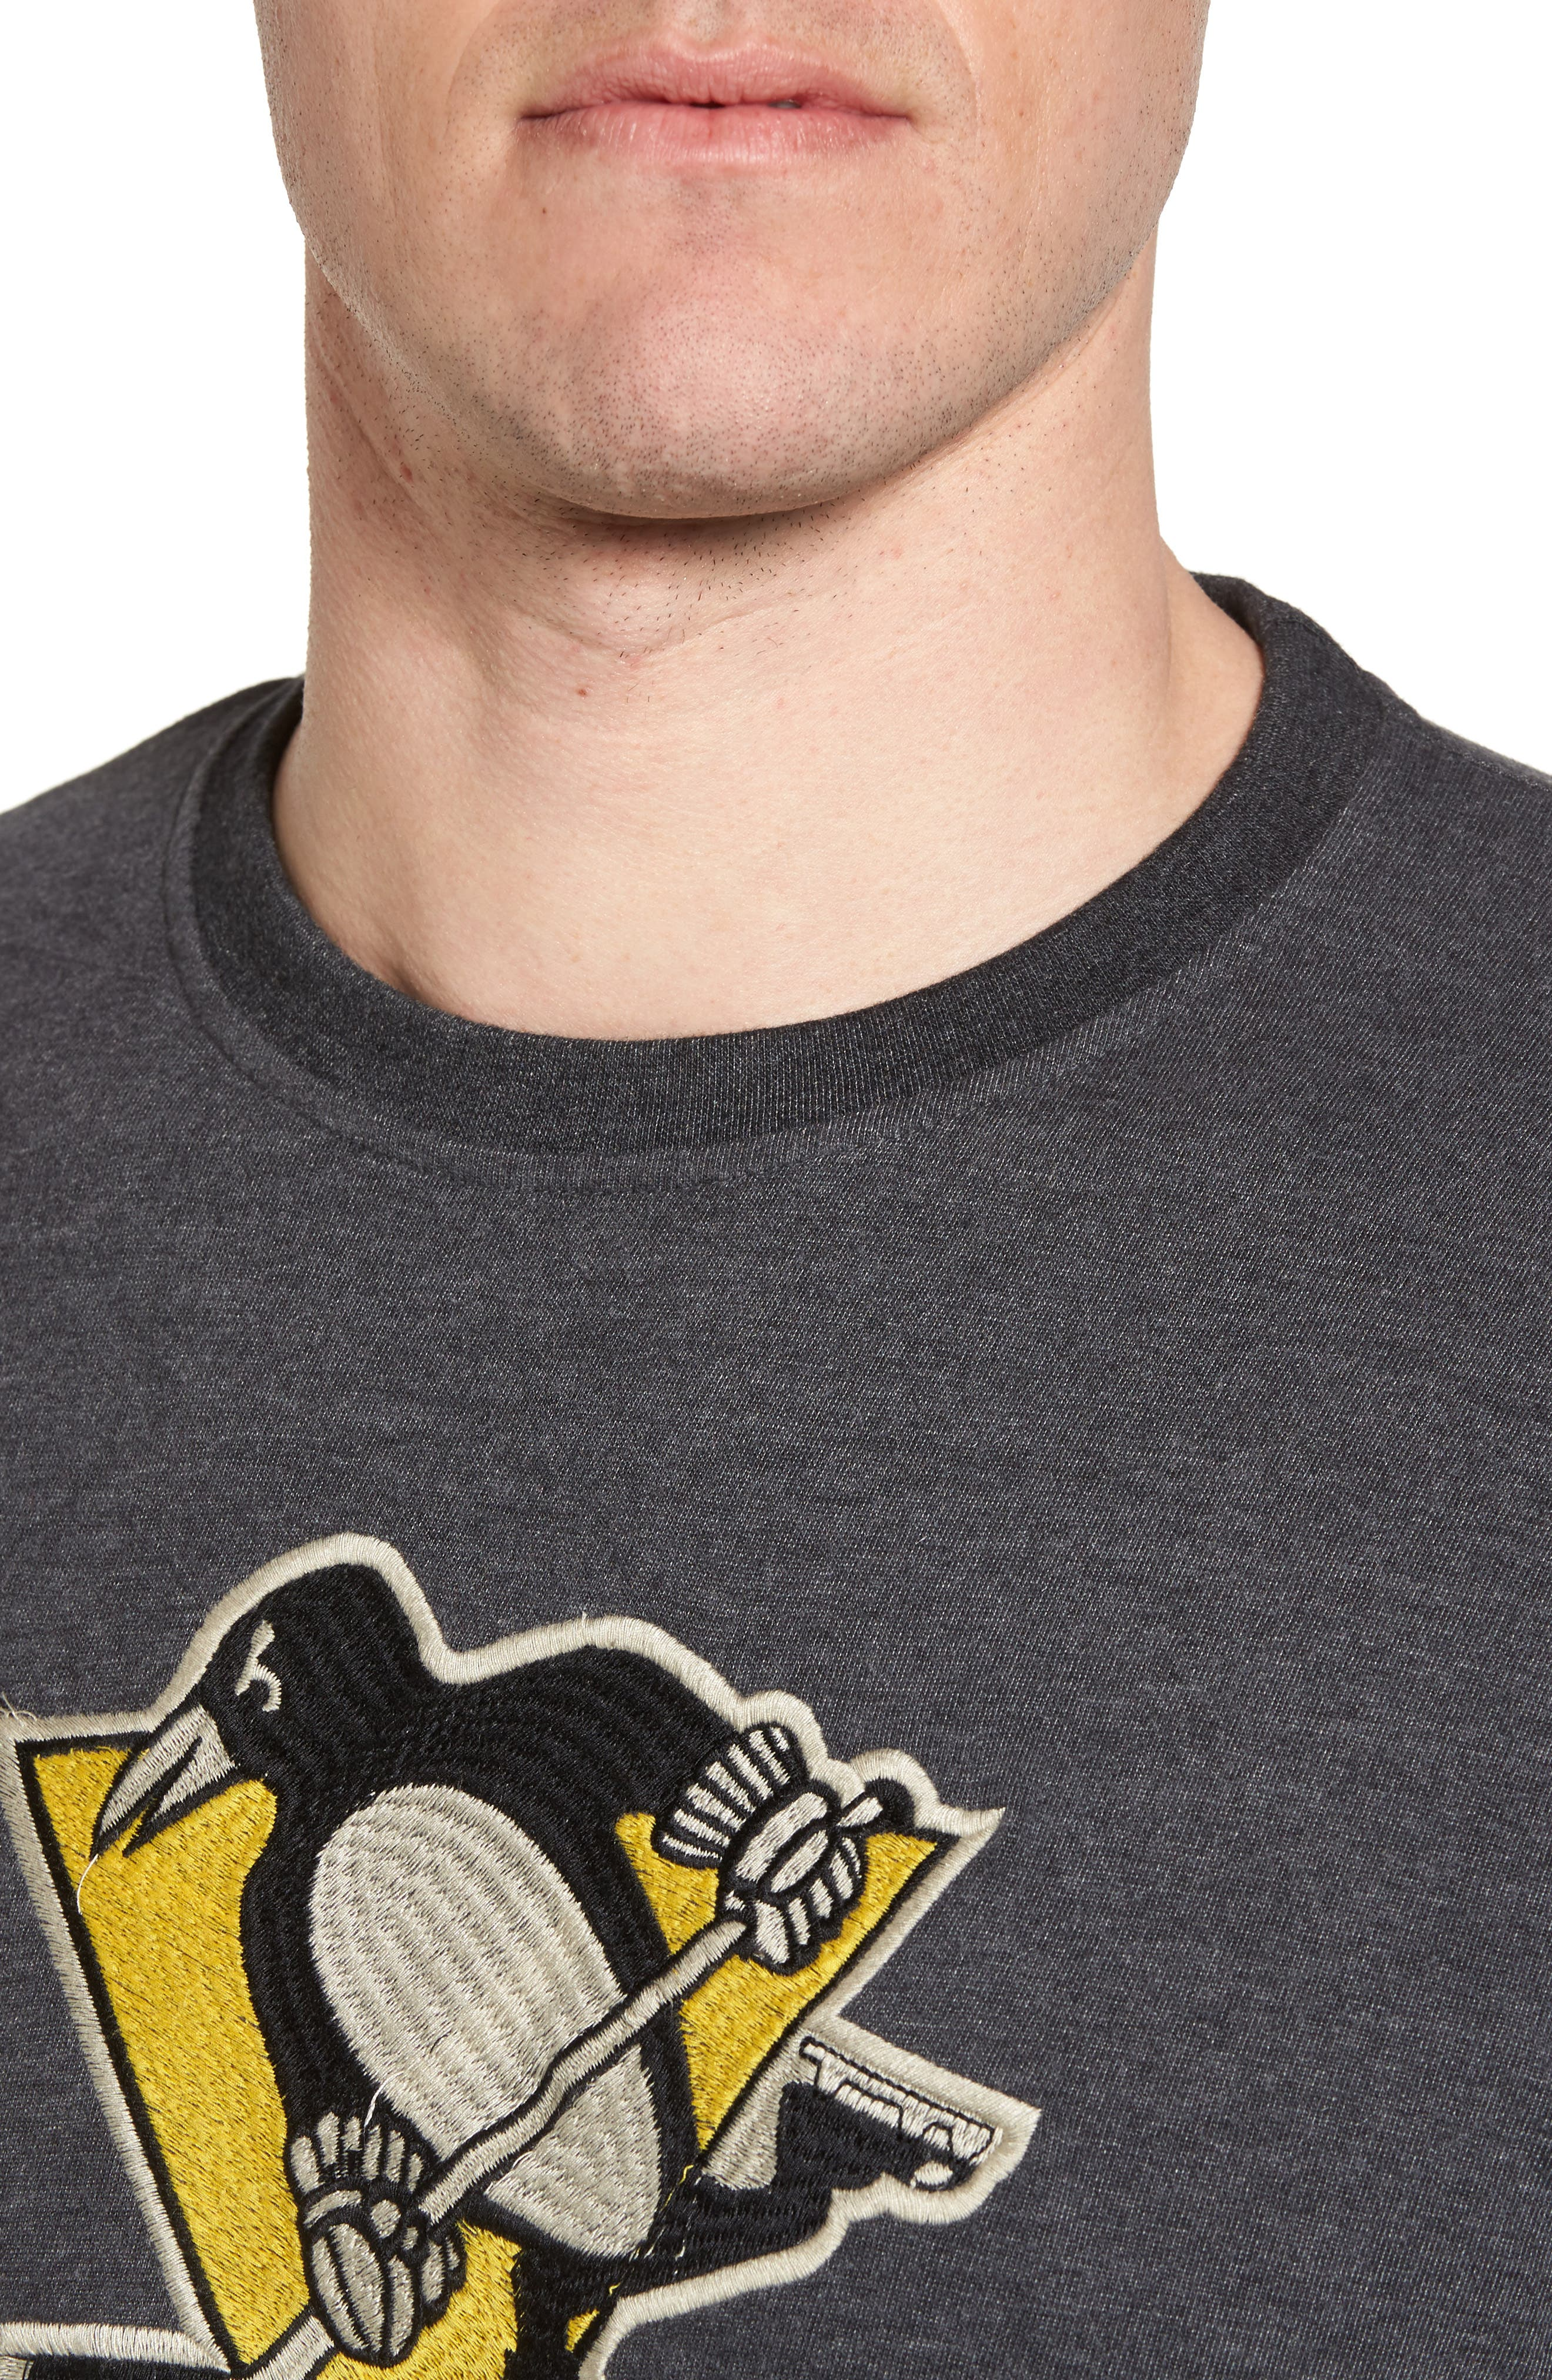 Hillwood Penguins T-Shirt,                             Alternate thumbnail 4, color,                             Heather Black